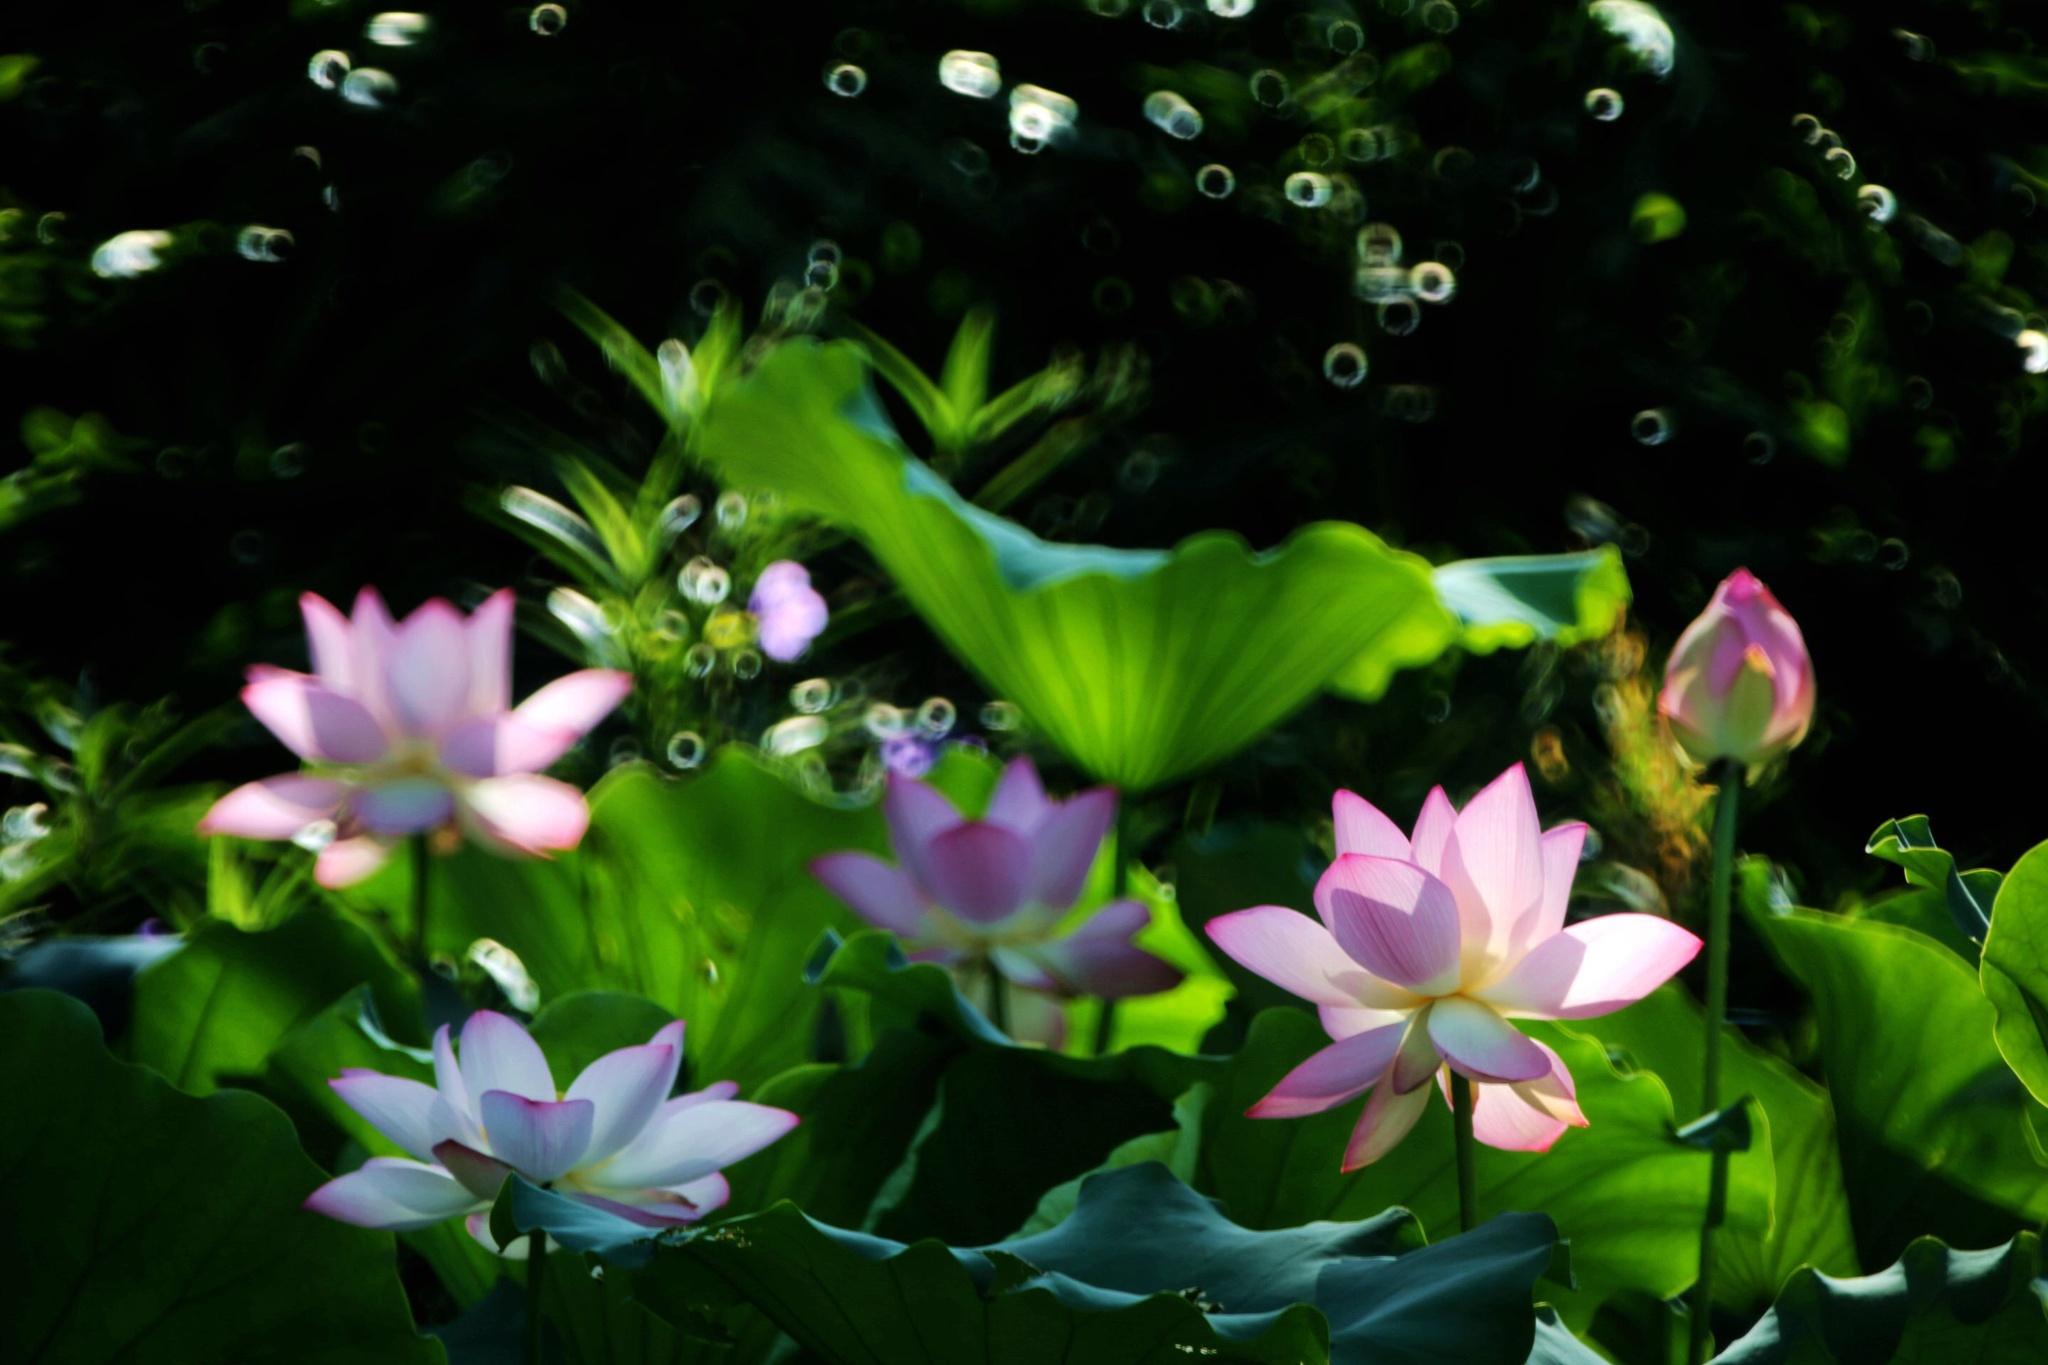 Untitled by Winnie Shao